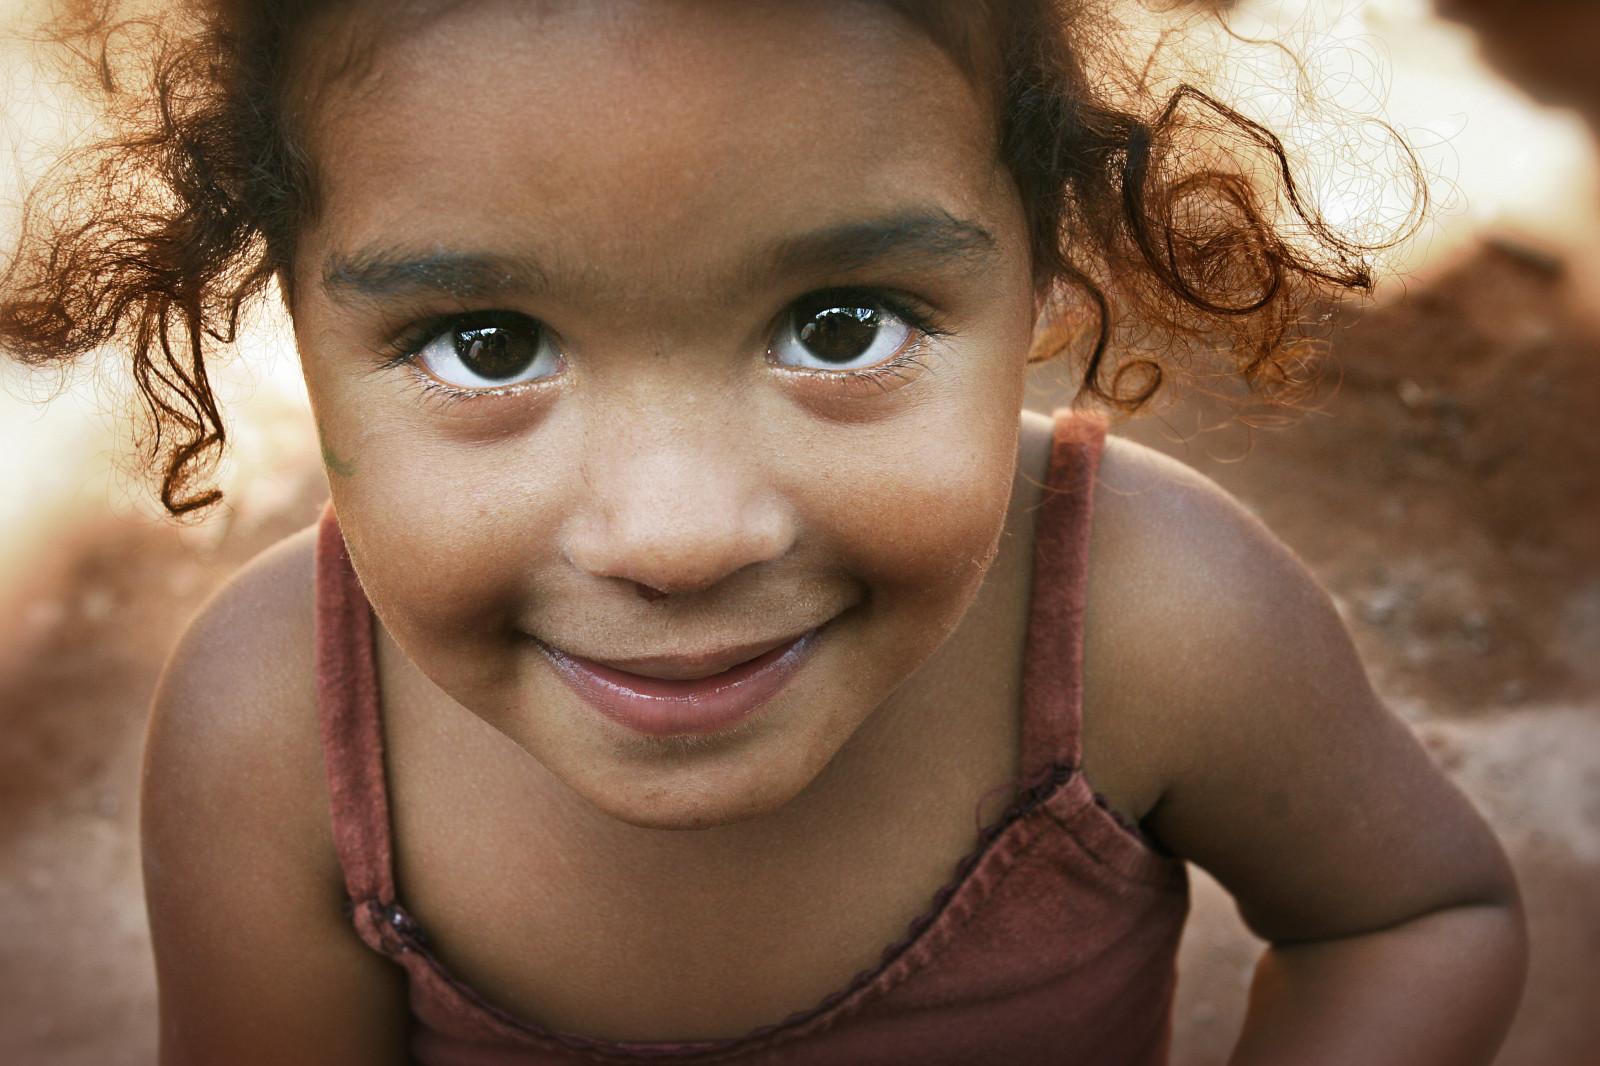 Poor Child Wallpaper Hd Wallpaper Face Model Eyes Children Earth Smiling